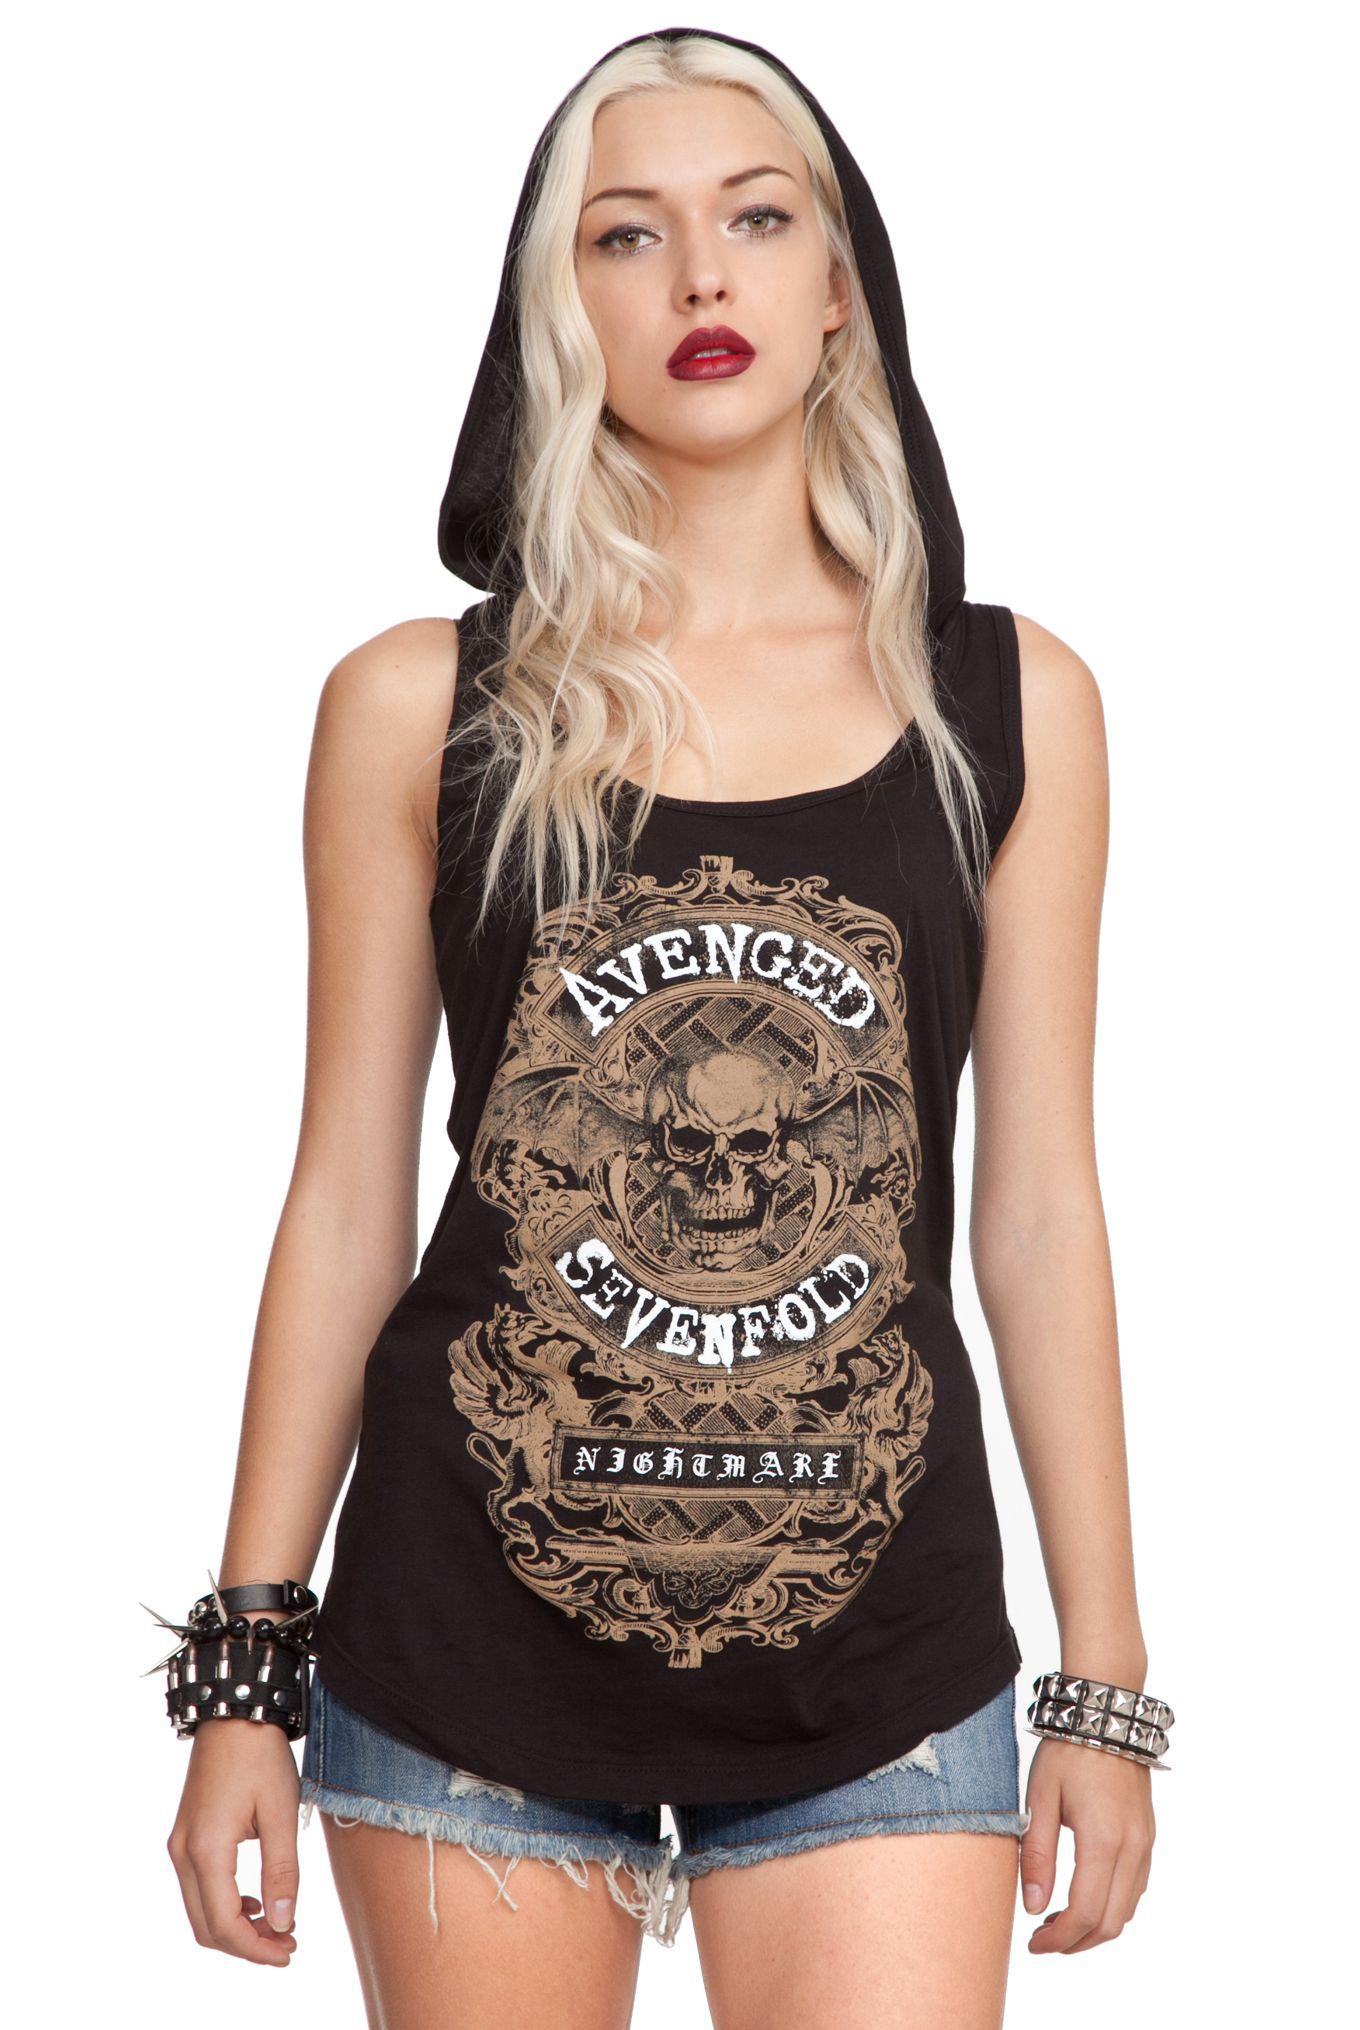 b2458f7e9e Avenged Sevenfold Nightmare Hooded Girls Tank Top